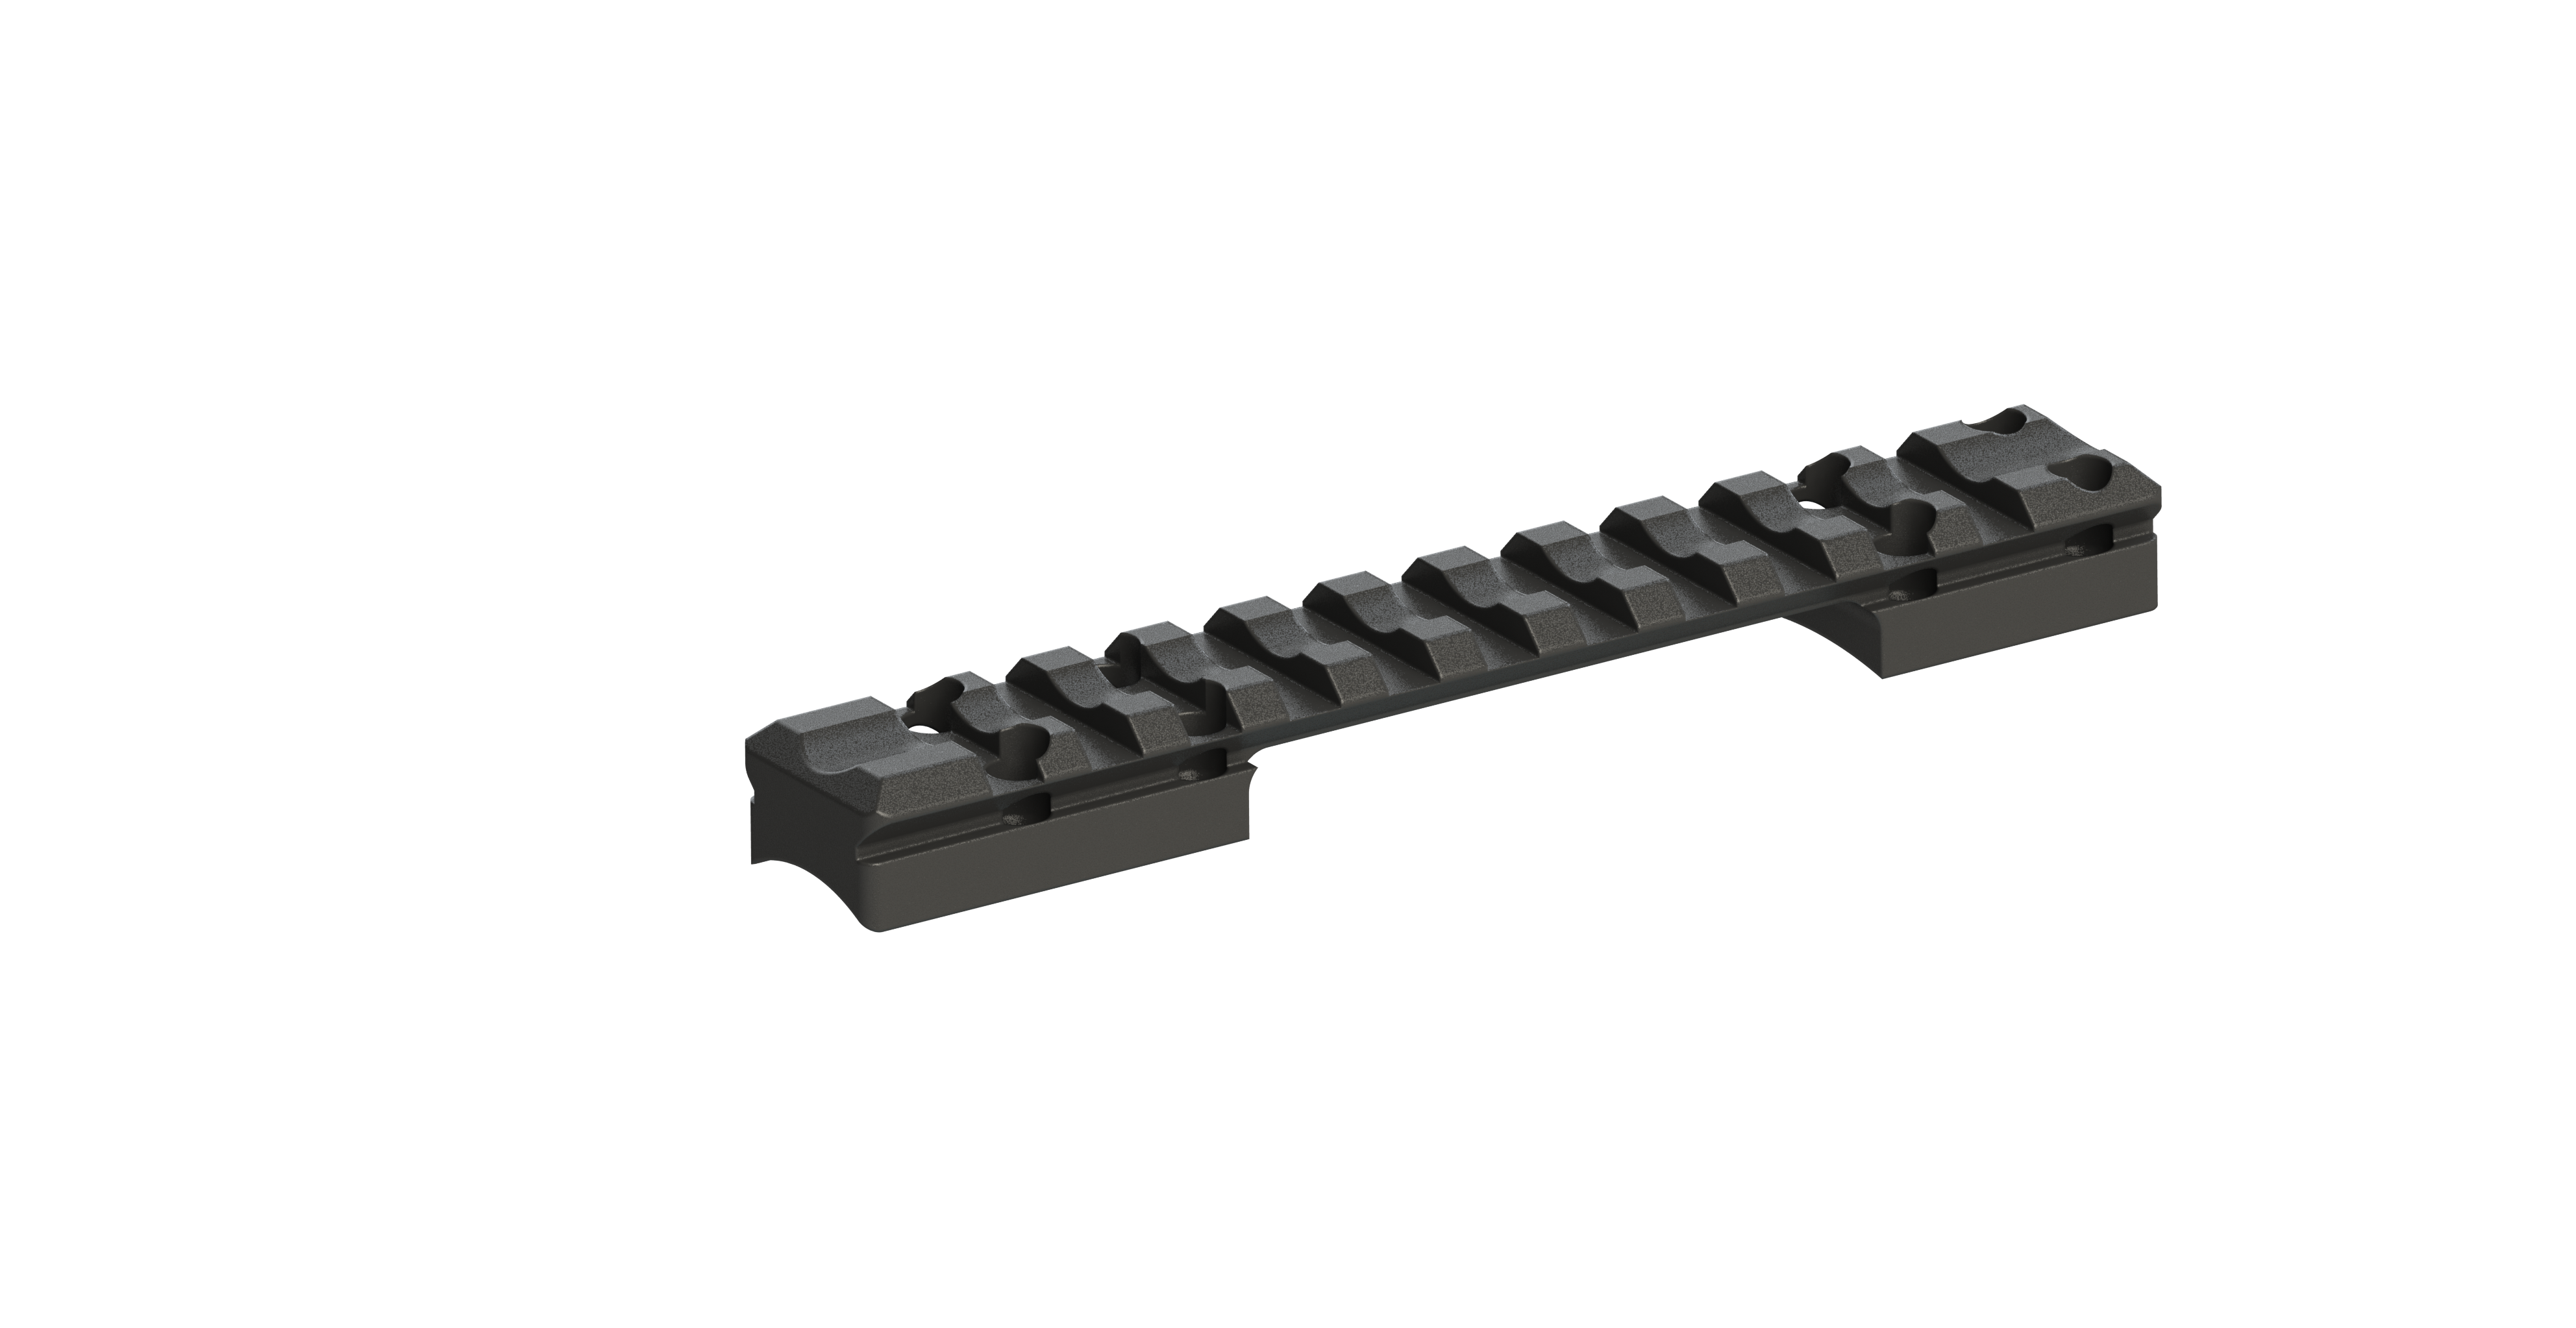 Recknagel Picatinny Schiene FN Browning - X-Bolt super short 20MOA